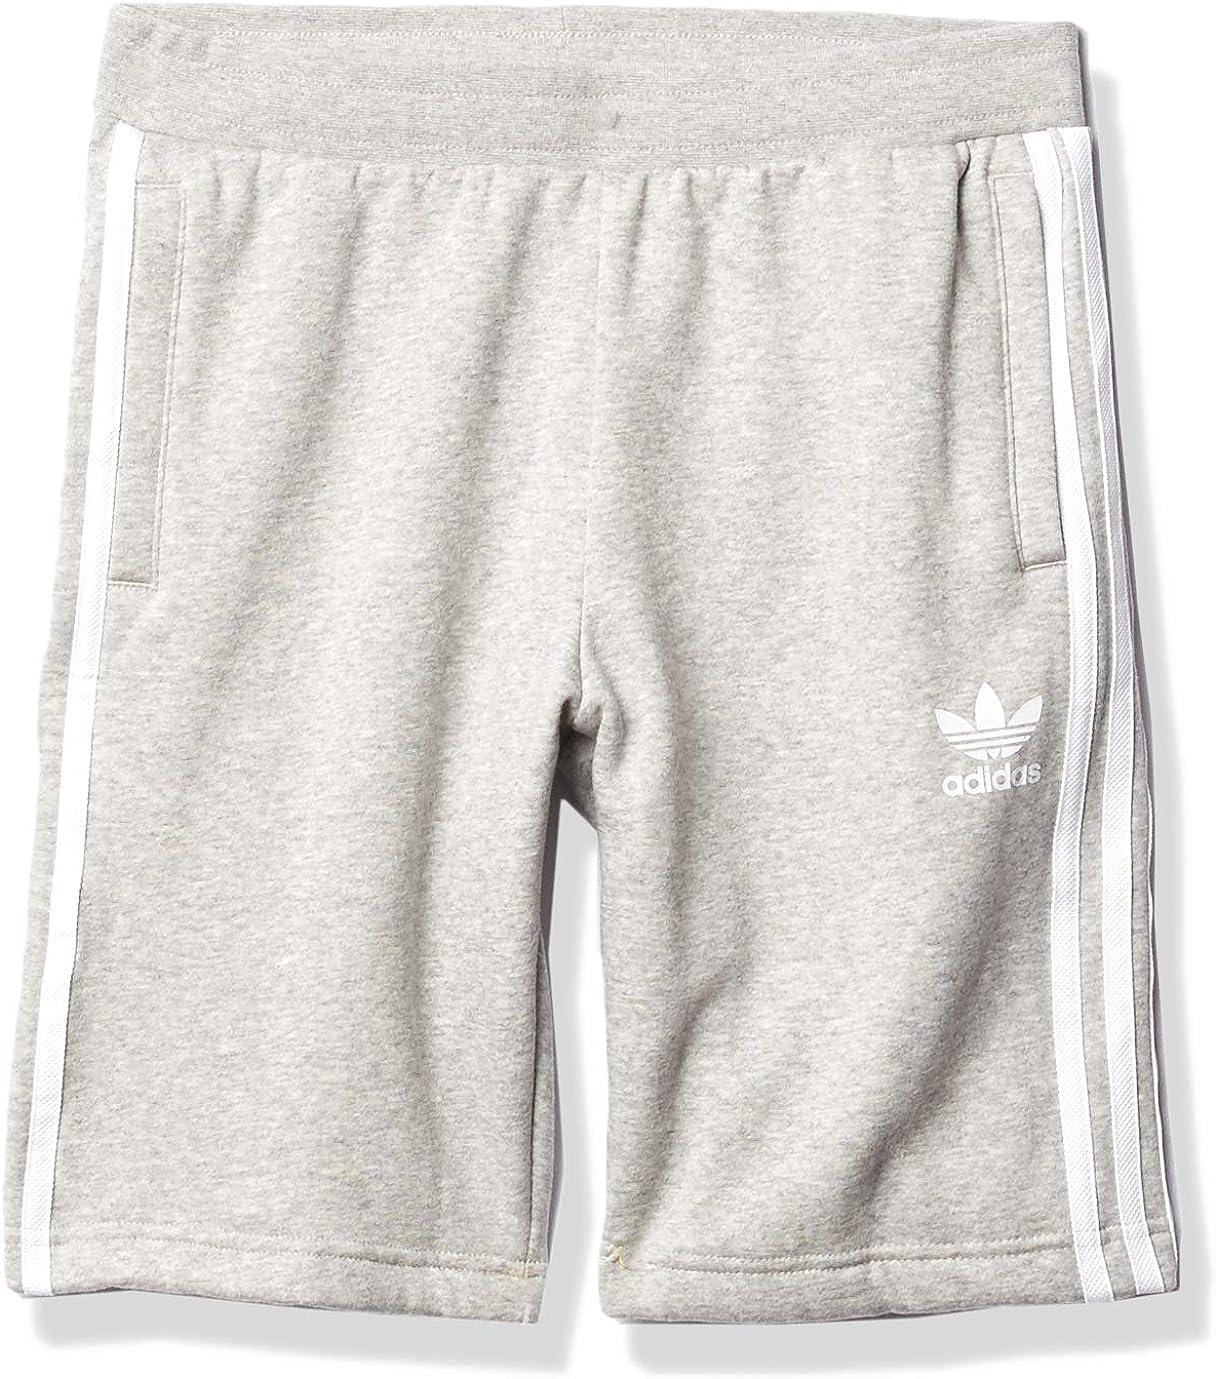 adidas Originals Boys' Fleece: Clothing